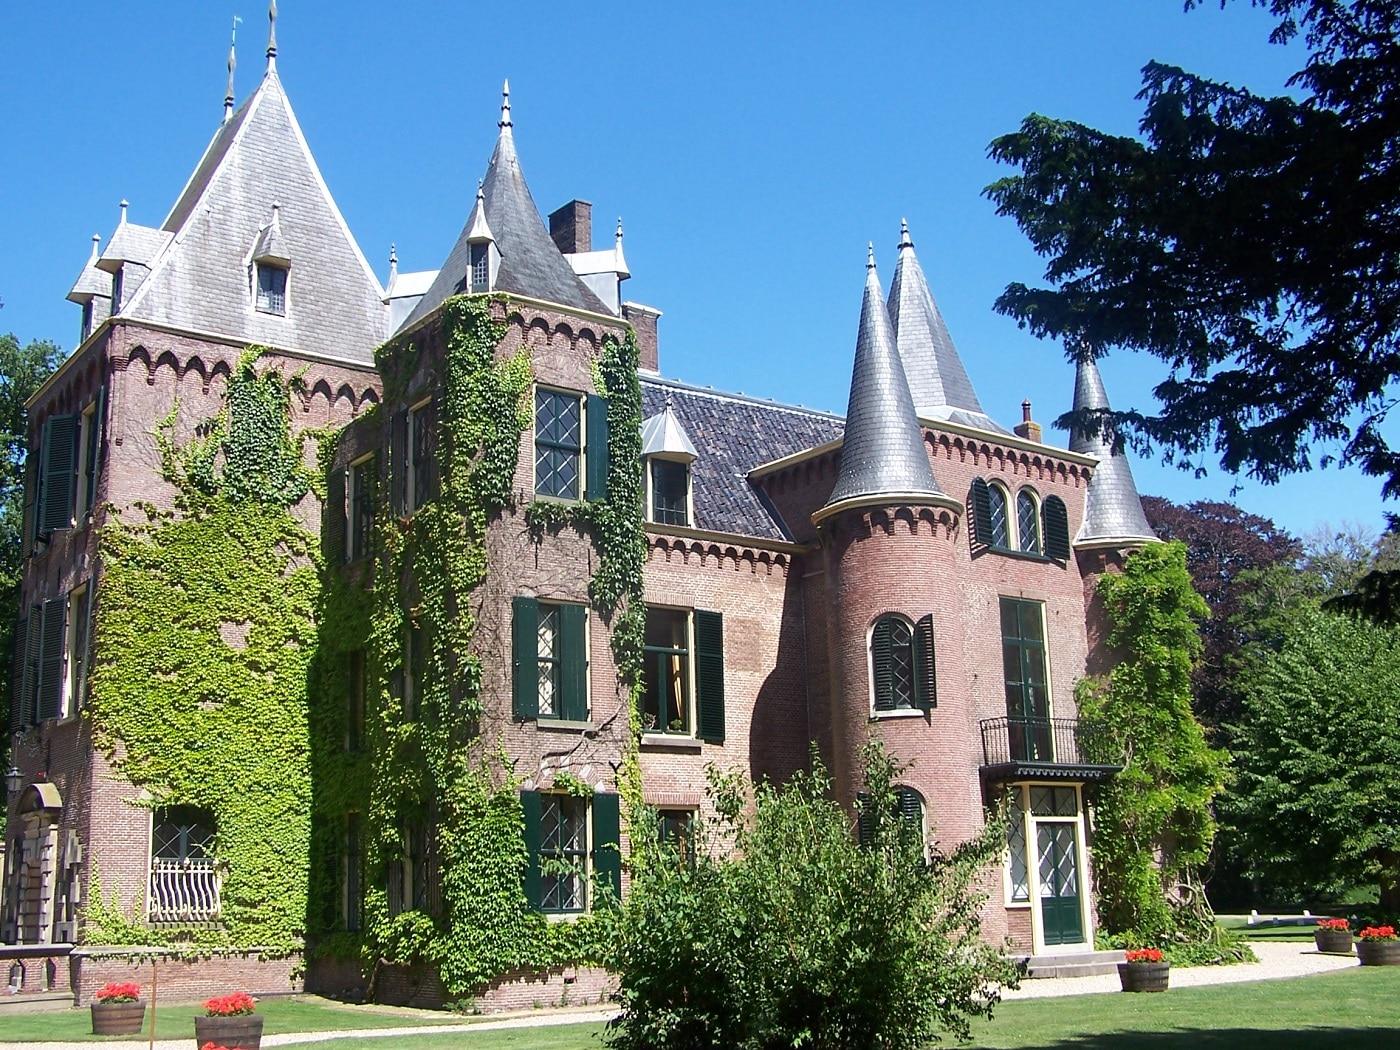 Castelul Keukenhof